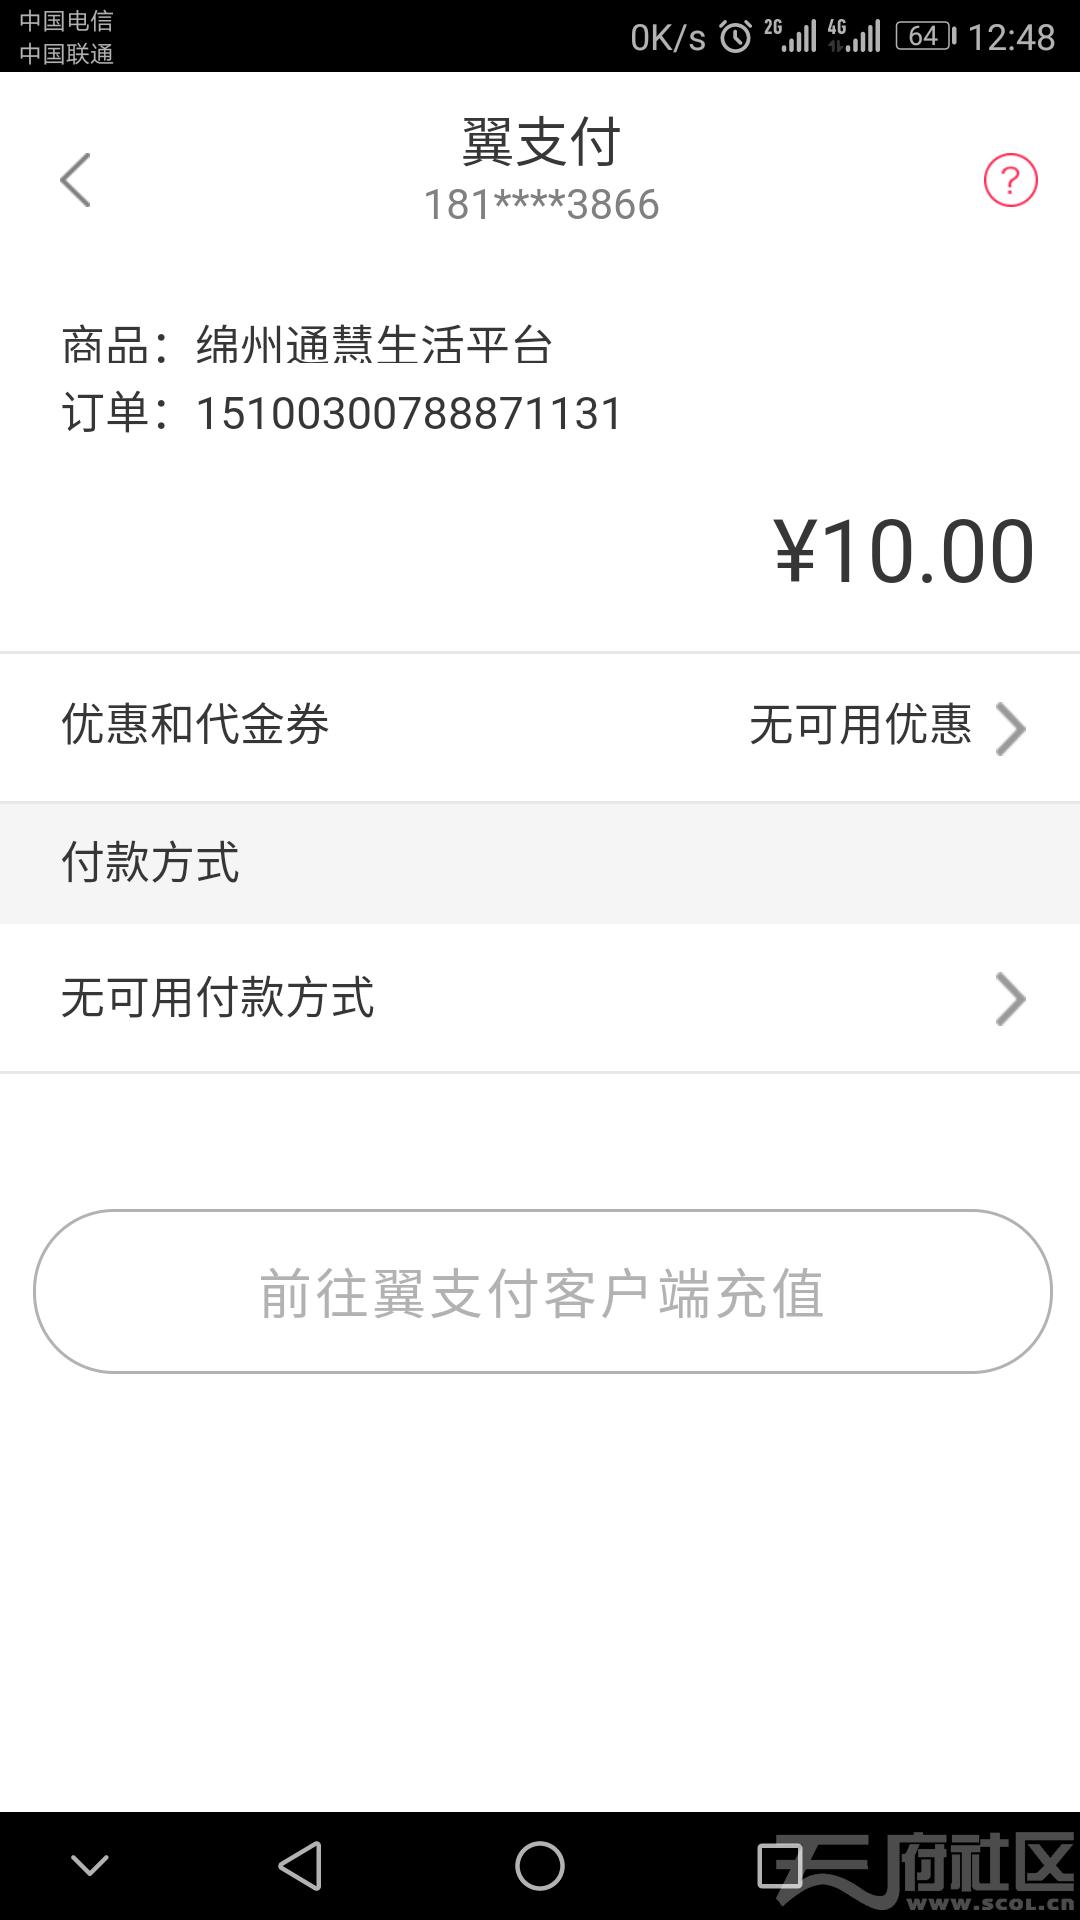 Screenshot_20171107-124819.png